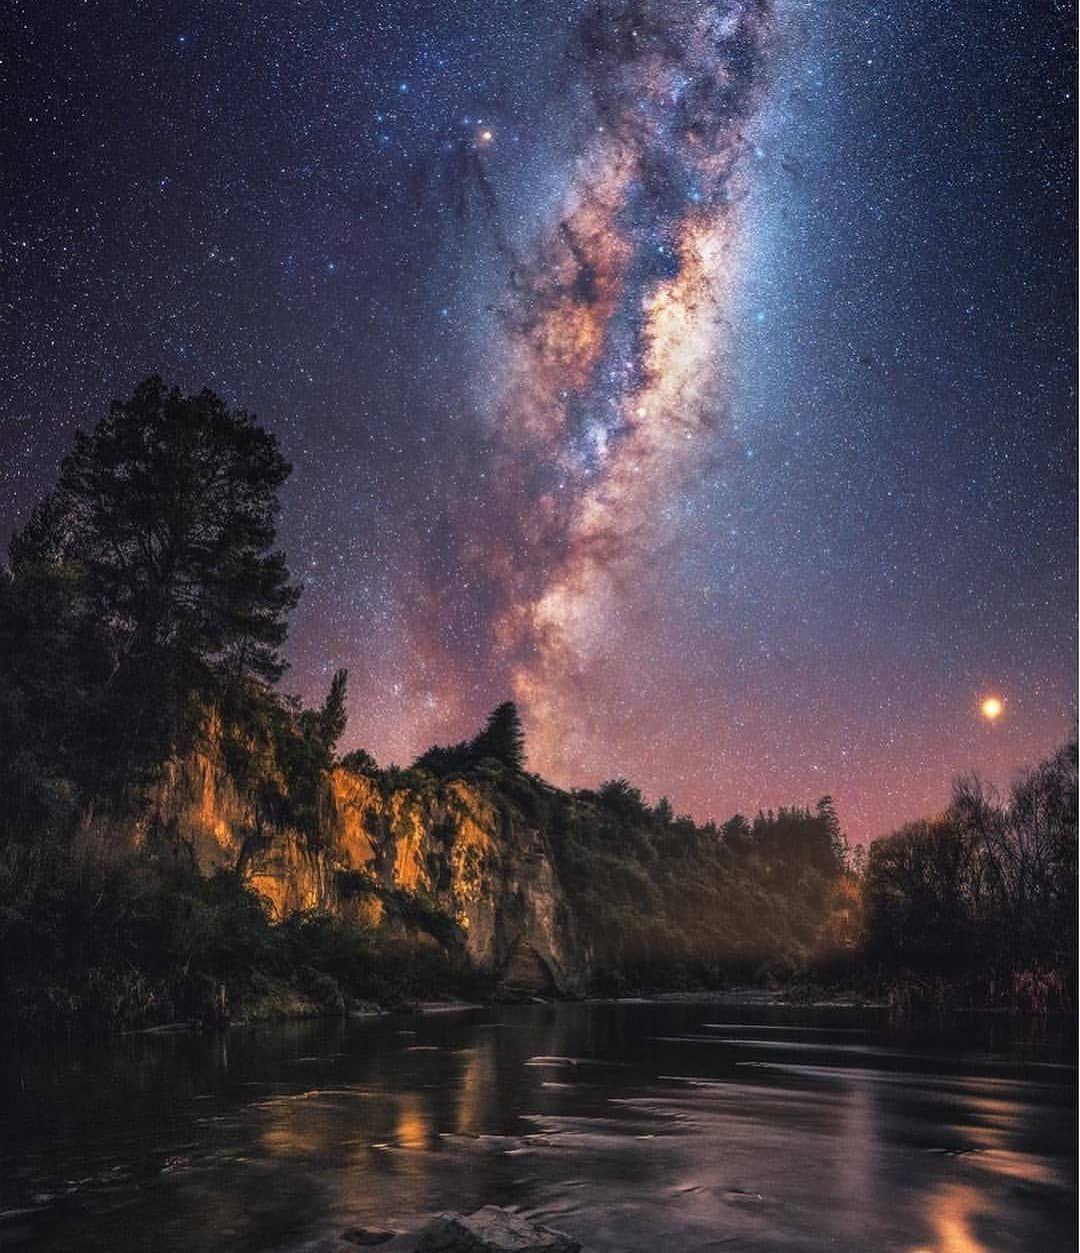 Muharip Gazi Night Landscape Night Skies Milky Way